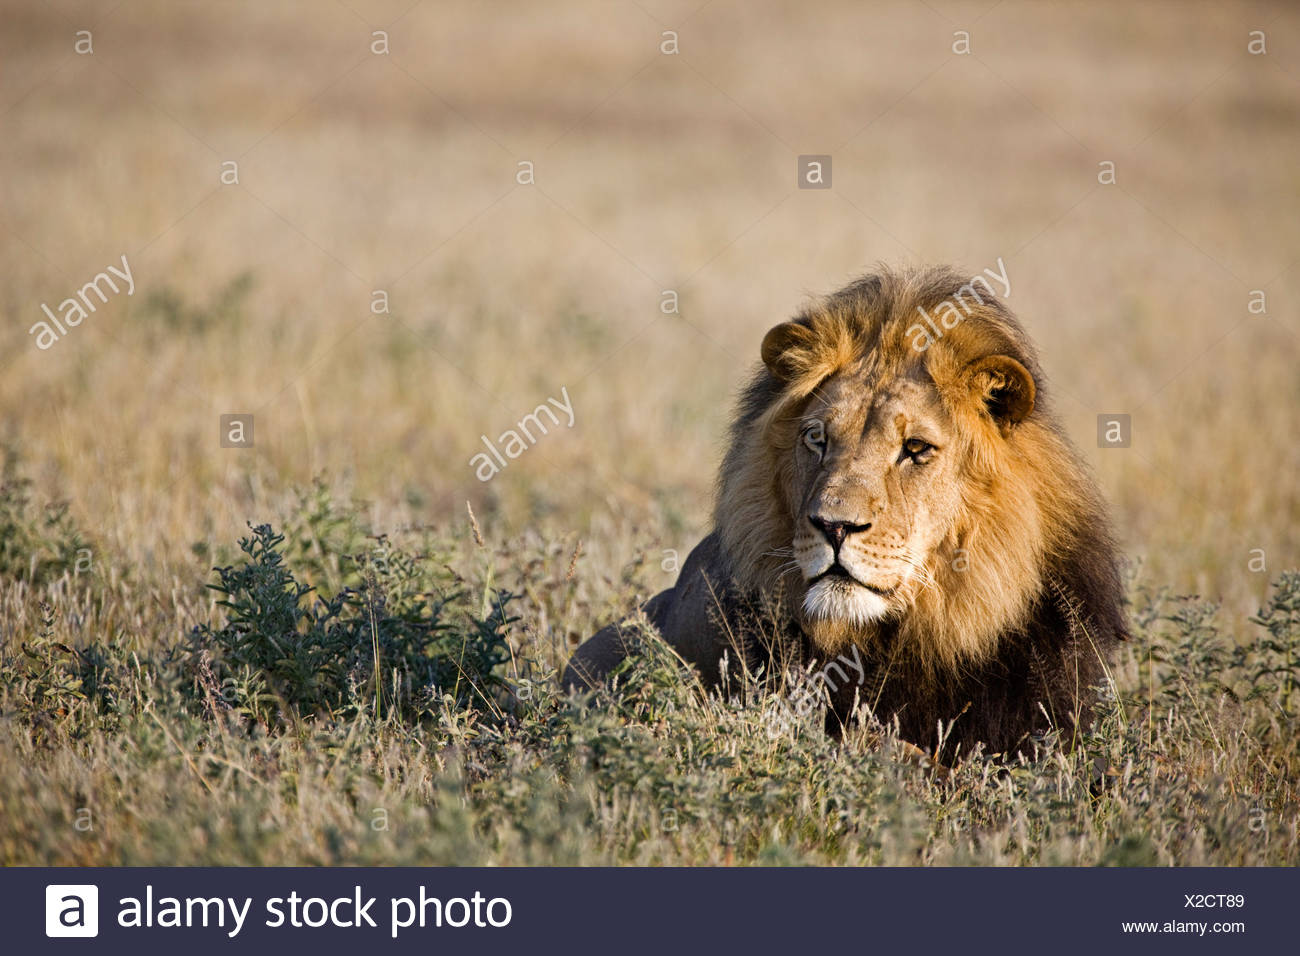 Africa, Botswana, Adult male lion (Panthera leo) resting on grass - Stock Image